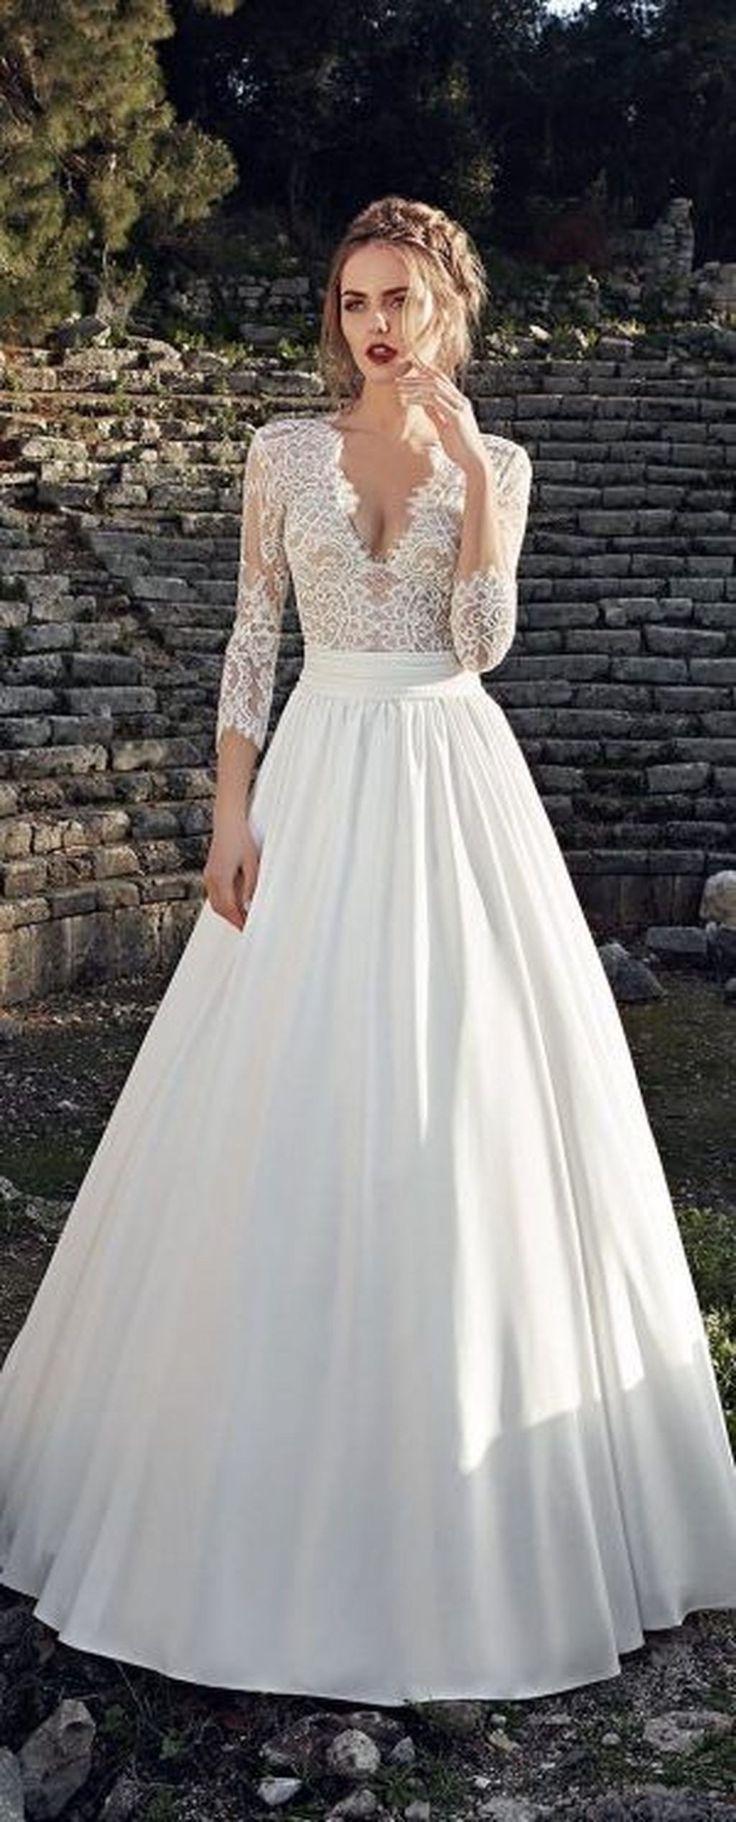 Best 25 Casual outdoor weddings ideas on Pinterest  Classy backyard wedding Outdoor wedding